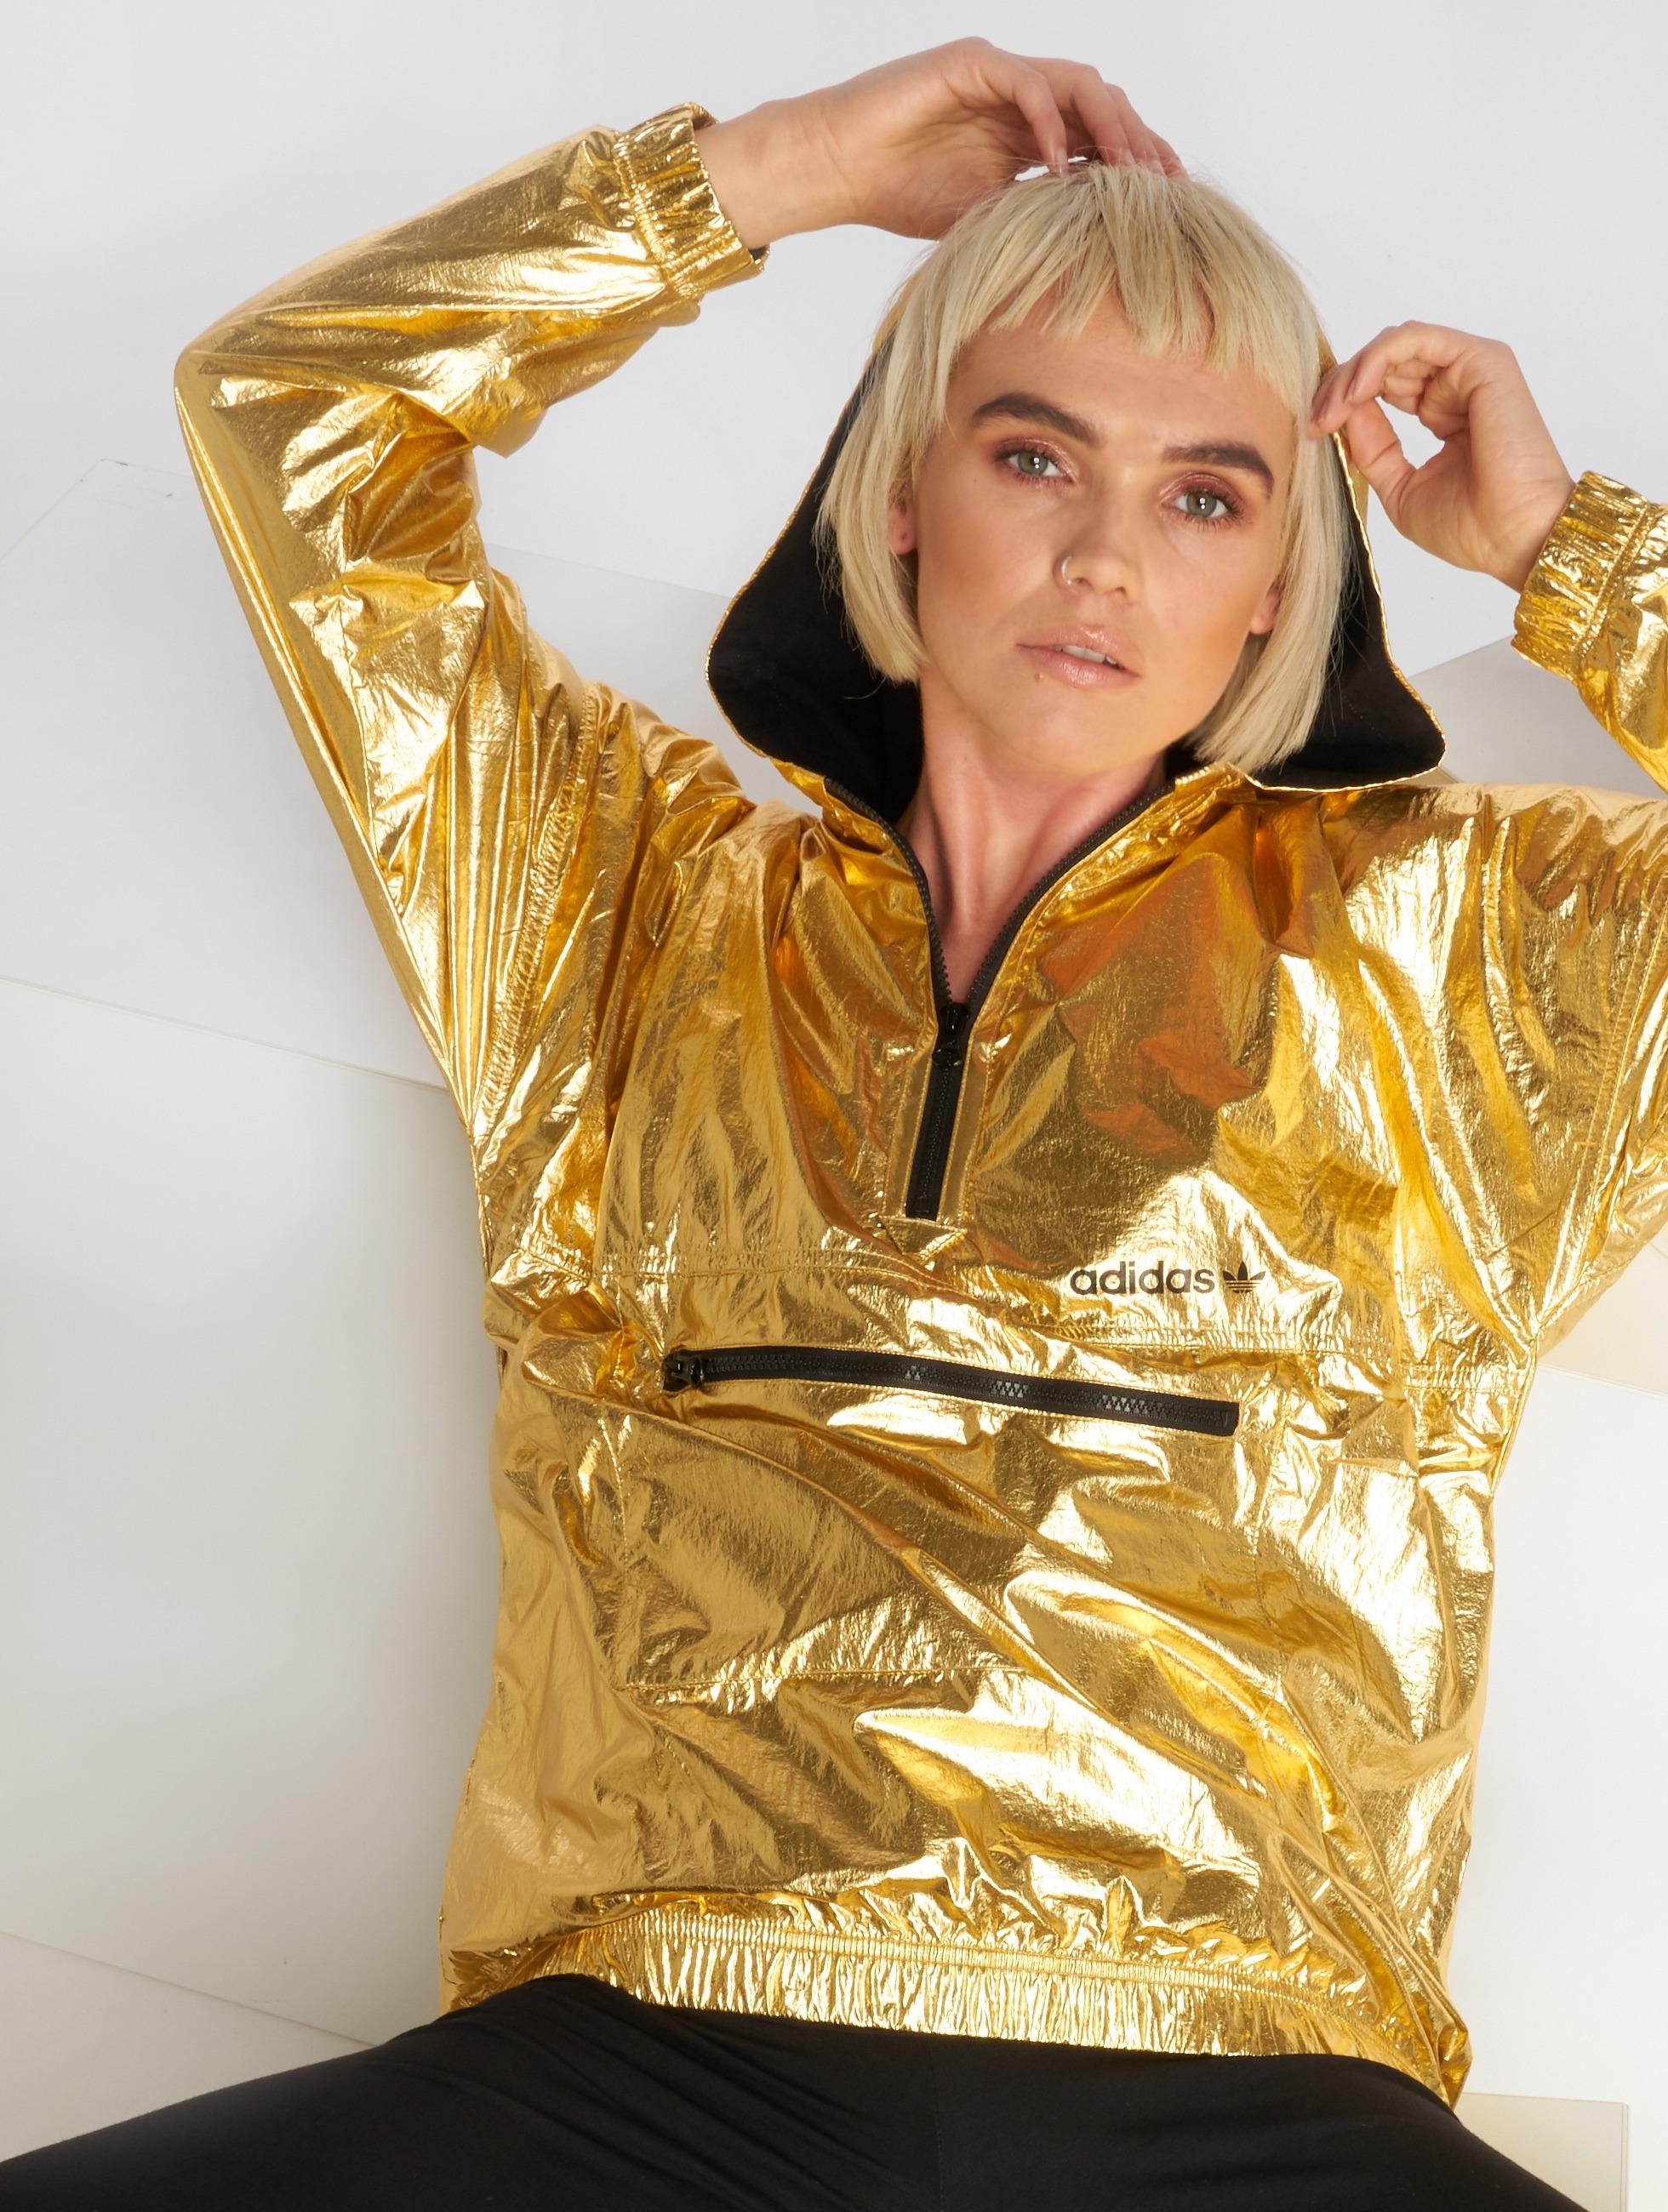 adidas Frauen Übergangsjacke Golden in goldfarben